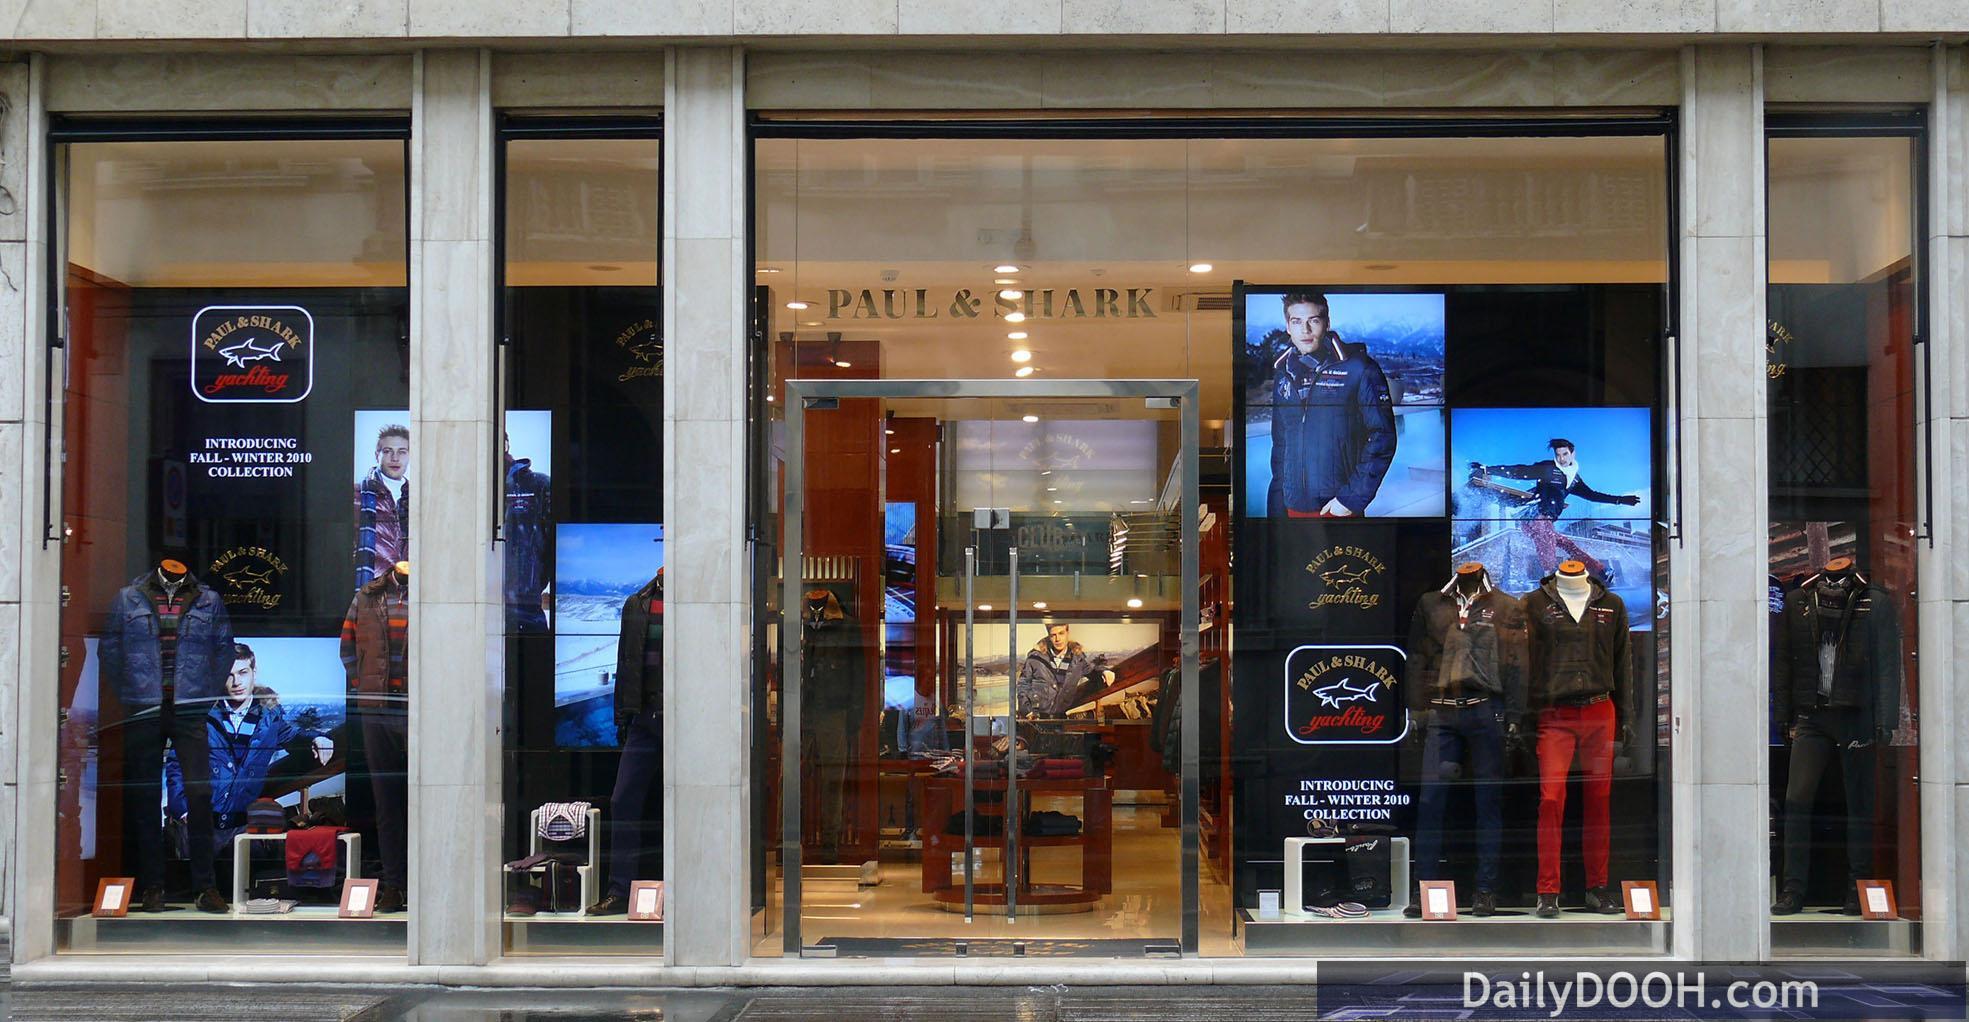 DailyDOOH » Blog Archive » Paul & Shark Digital Signage, Milan